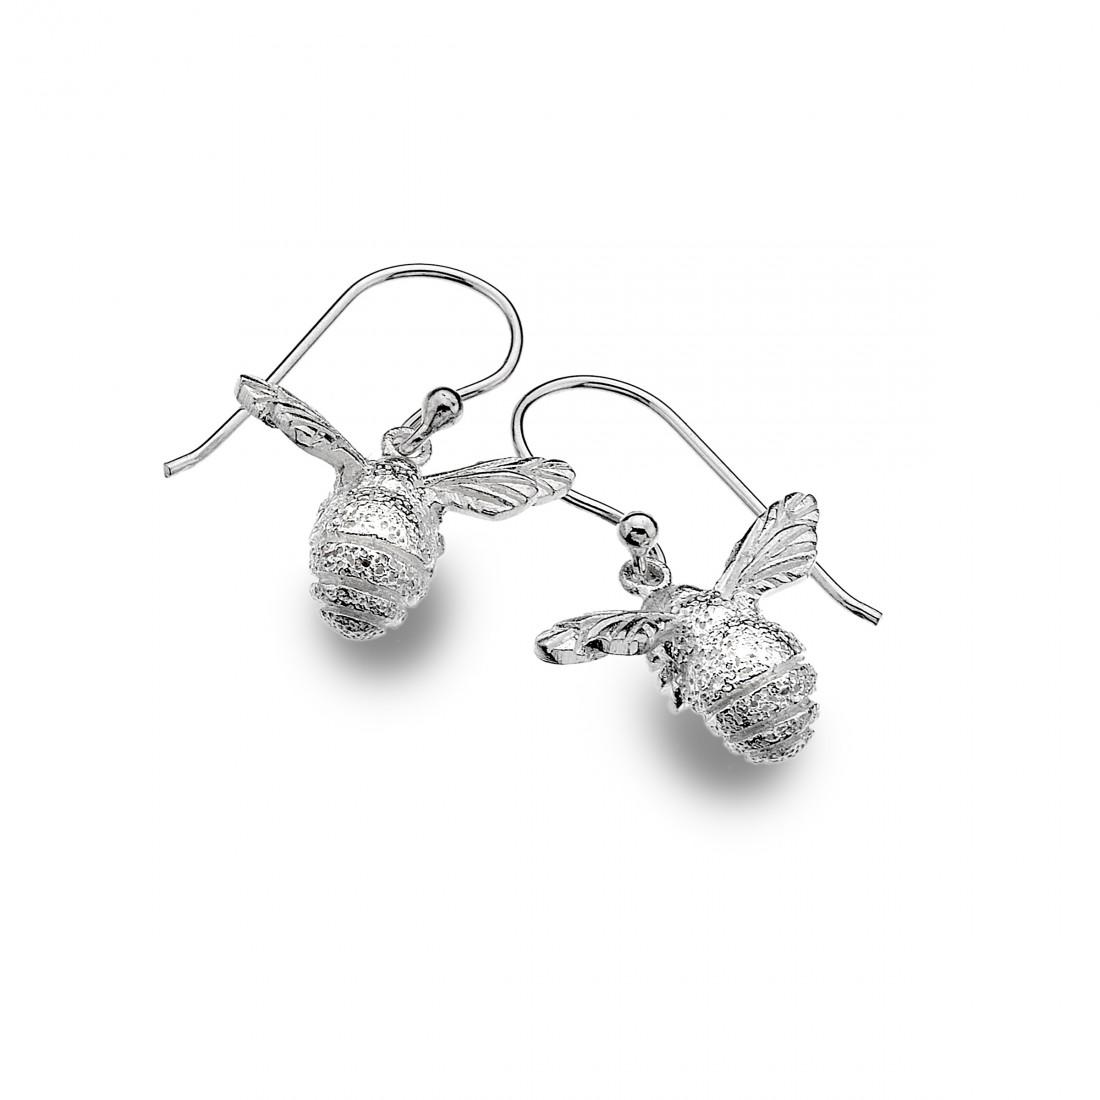 Sterling Silver Bumblee Earrings